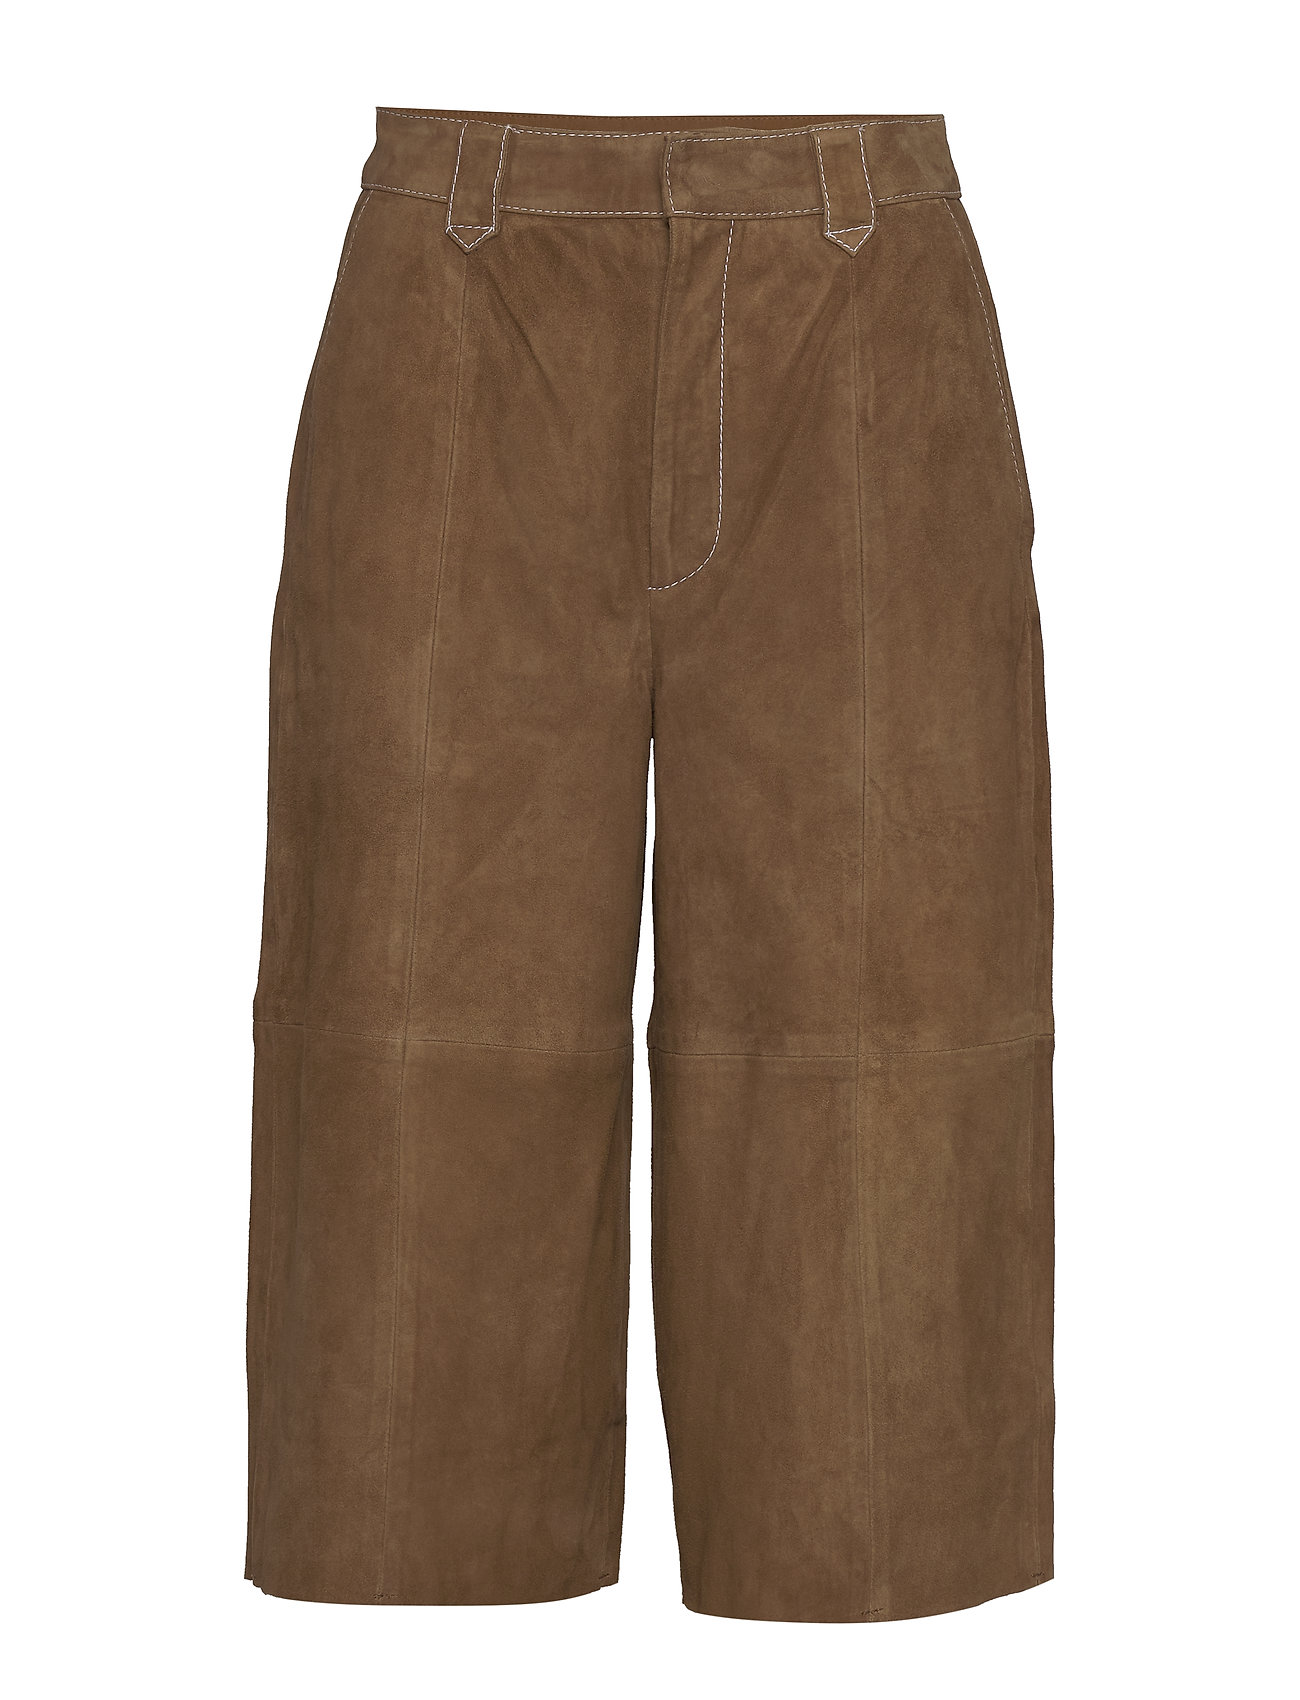 Gestuz EllieGZ shorts HS20 - TOFFEE